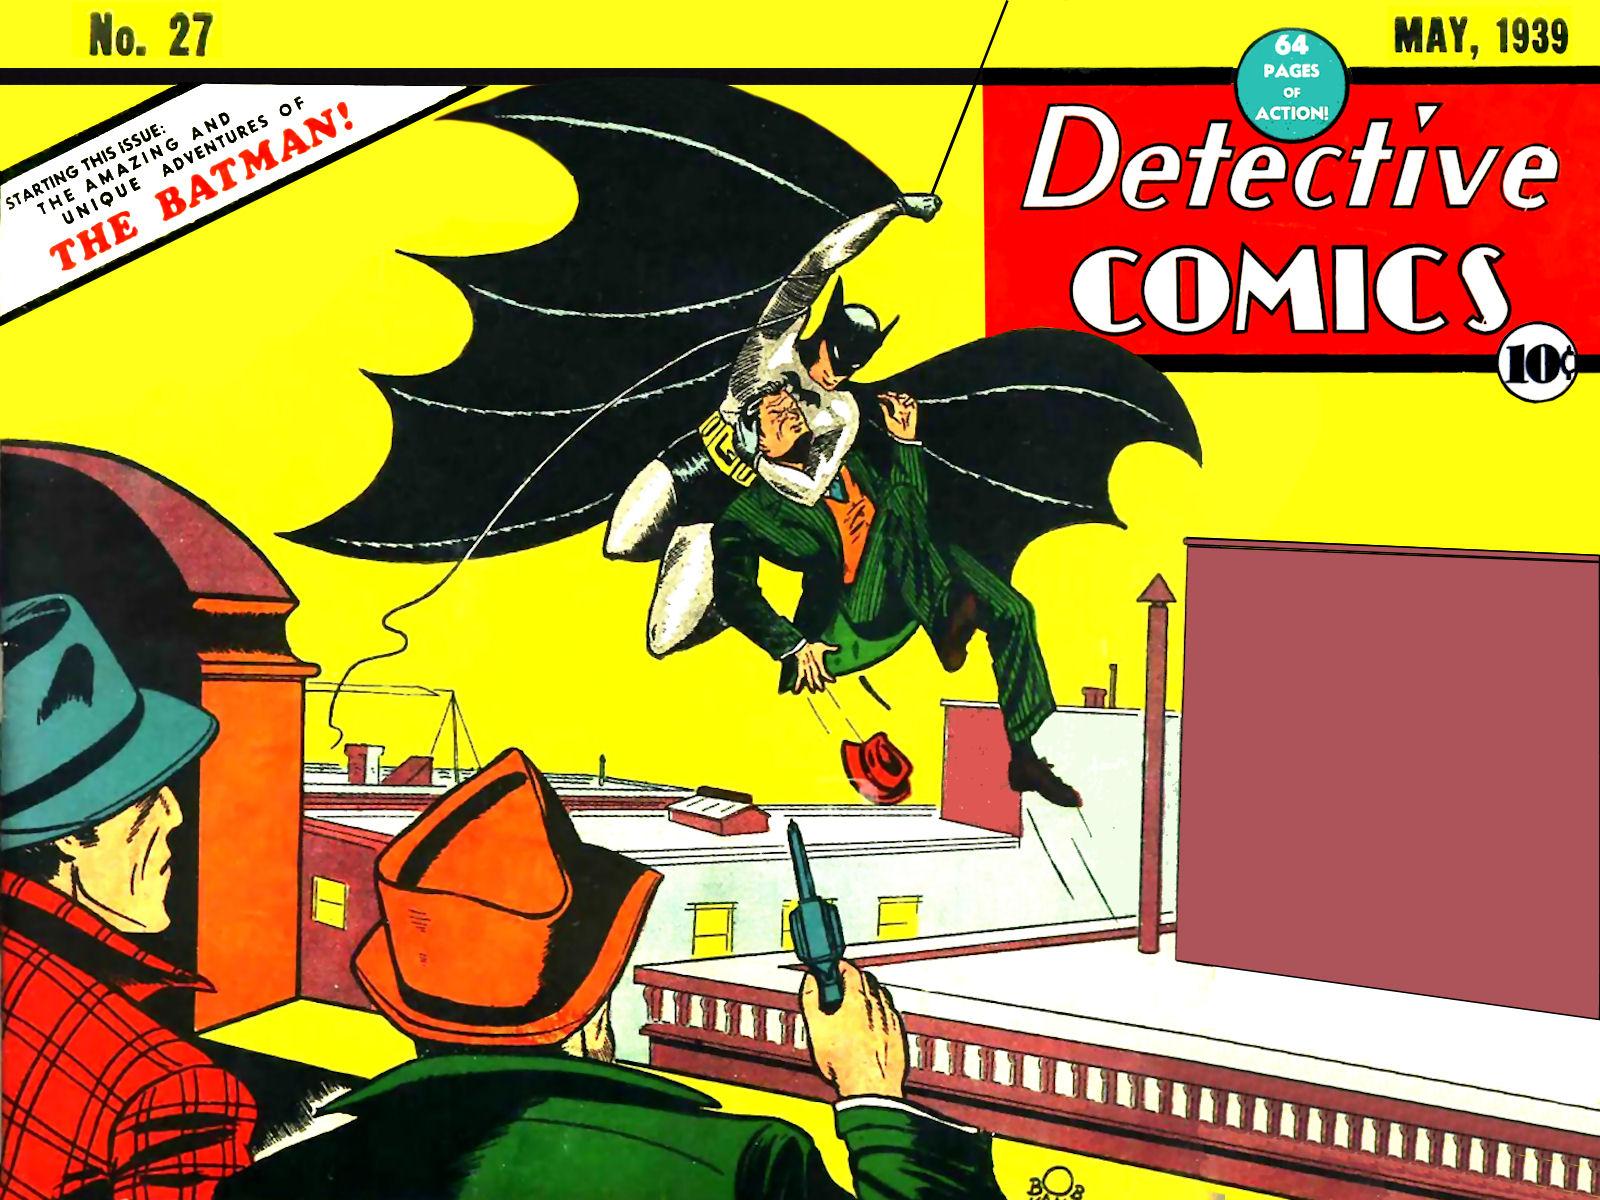 http://fc03.deviantart.net/fs71/f/2012/055/b/5/detective_comics_27_by_superman8193-d4qtmti.jpg